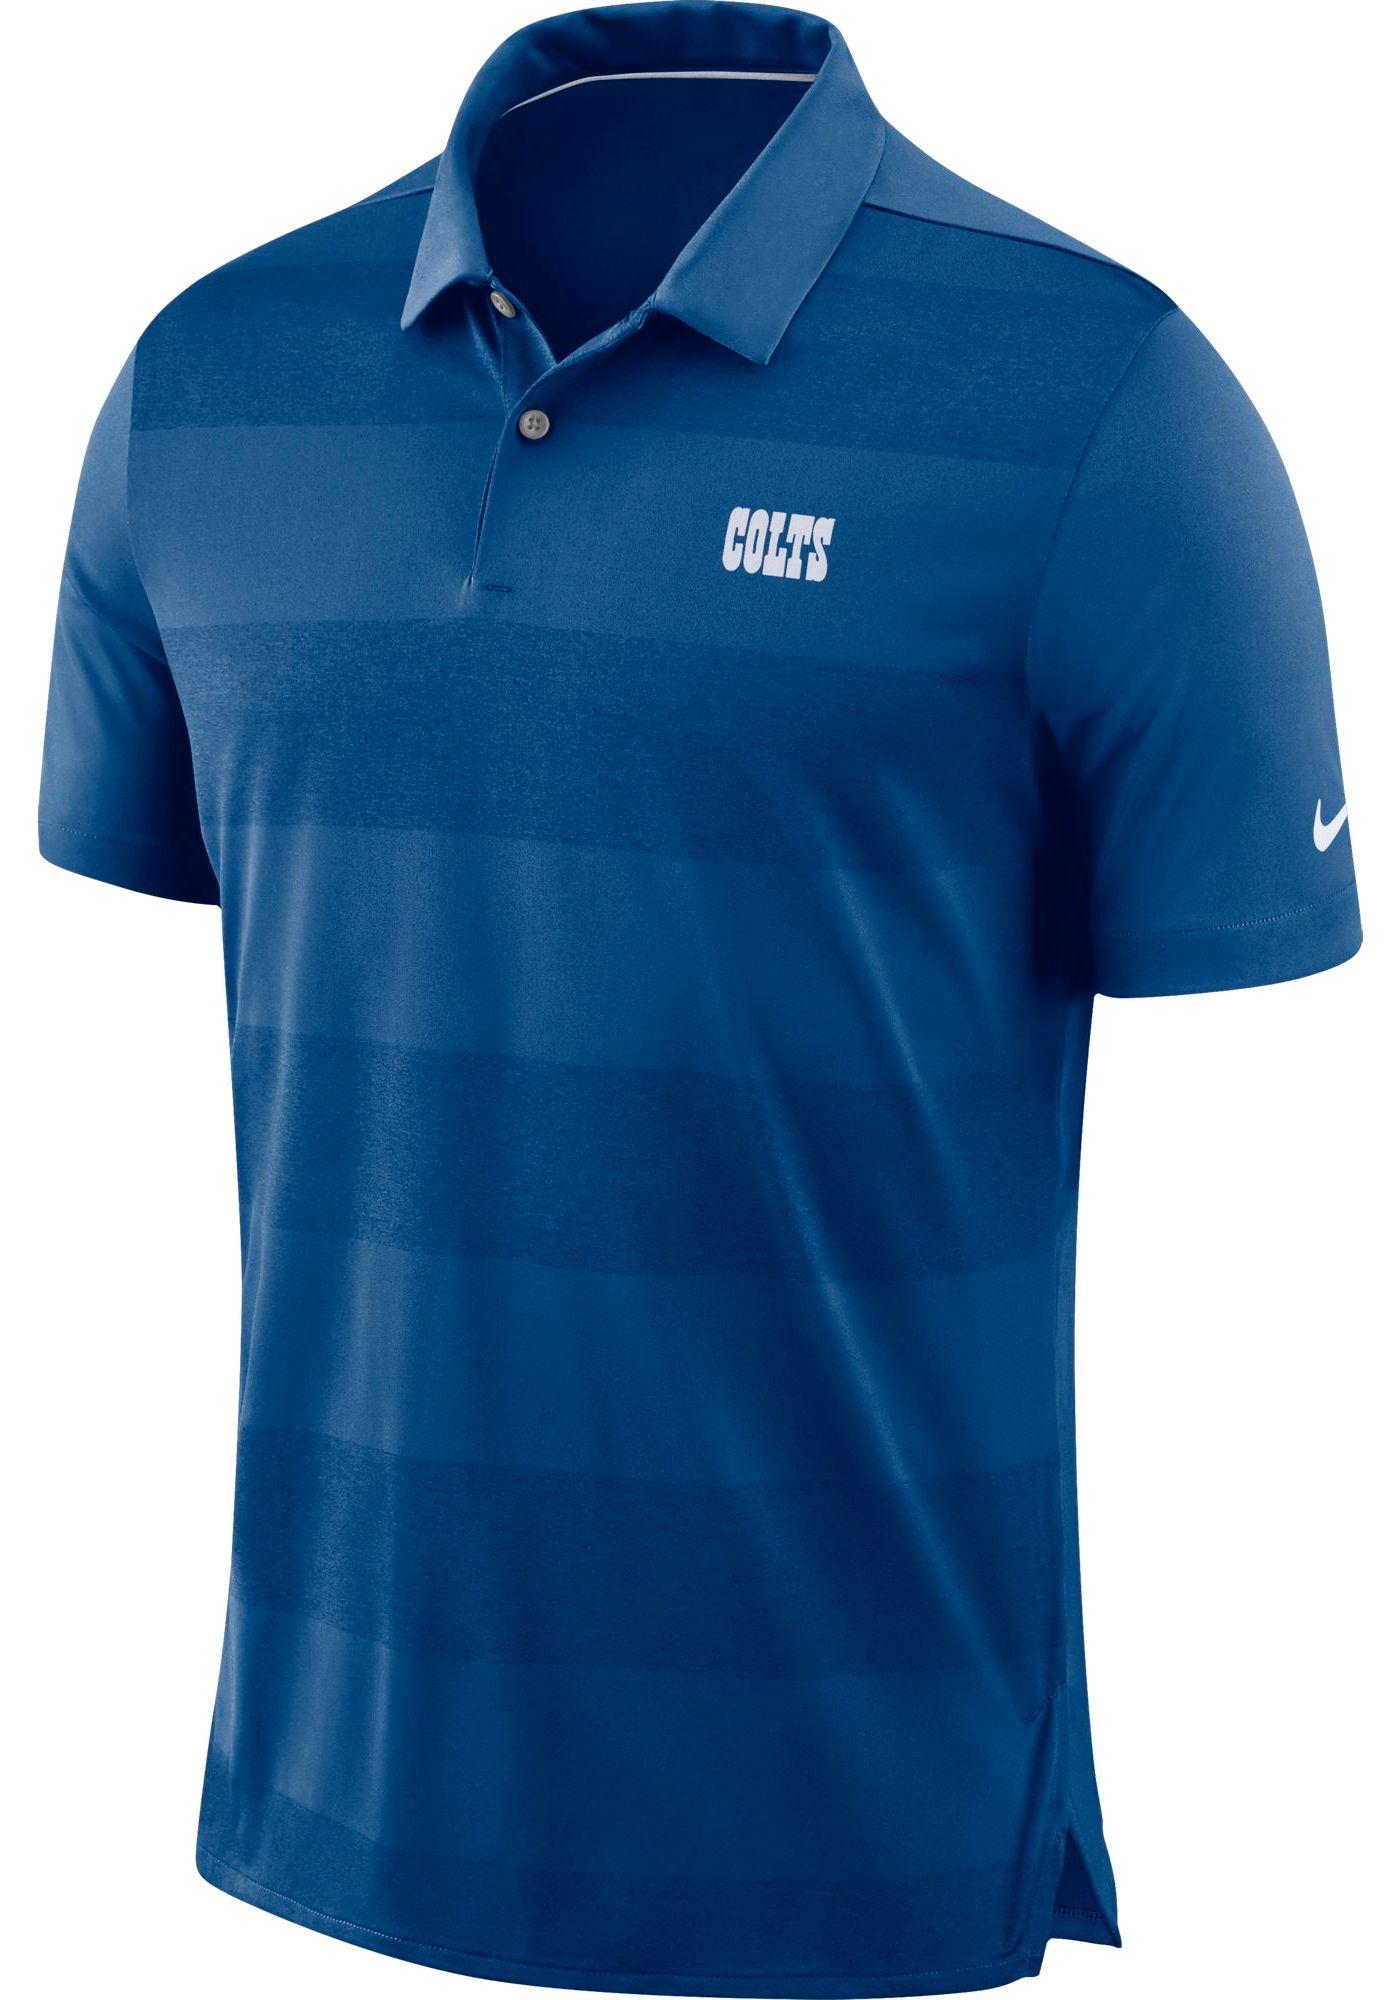 Nike Men's Indianapolis Colts Sideline Early Season Royal Polo